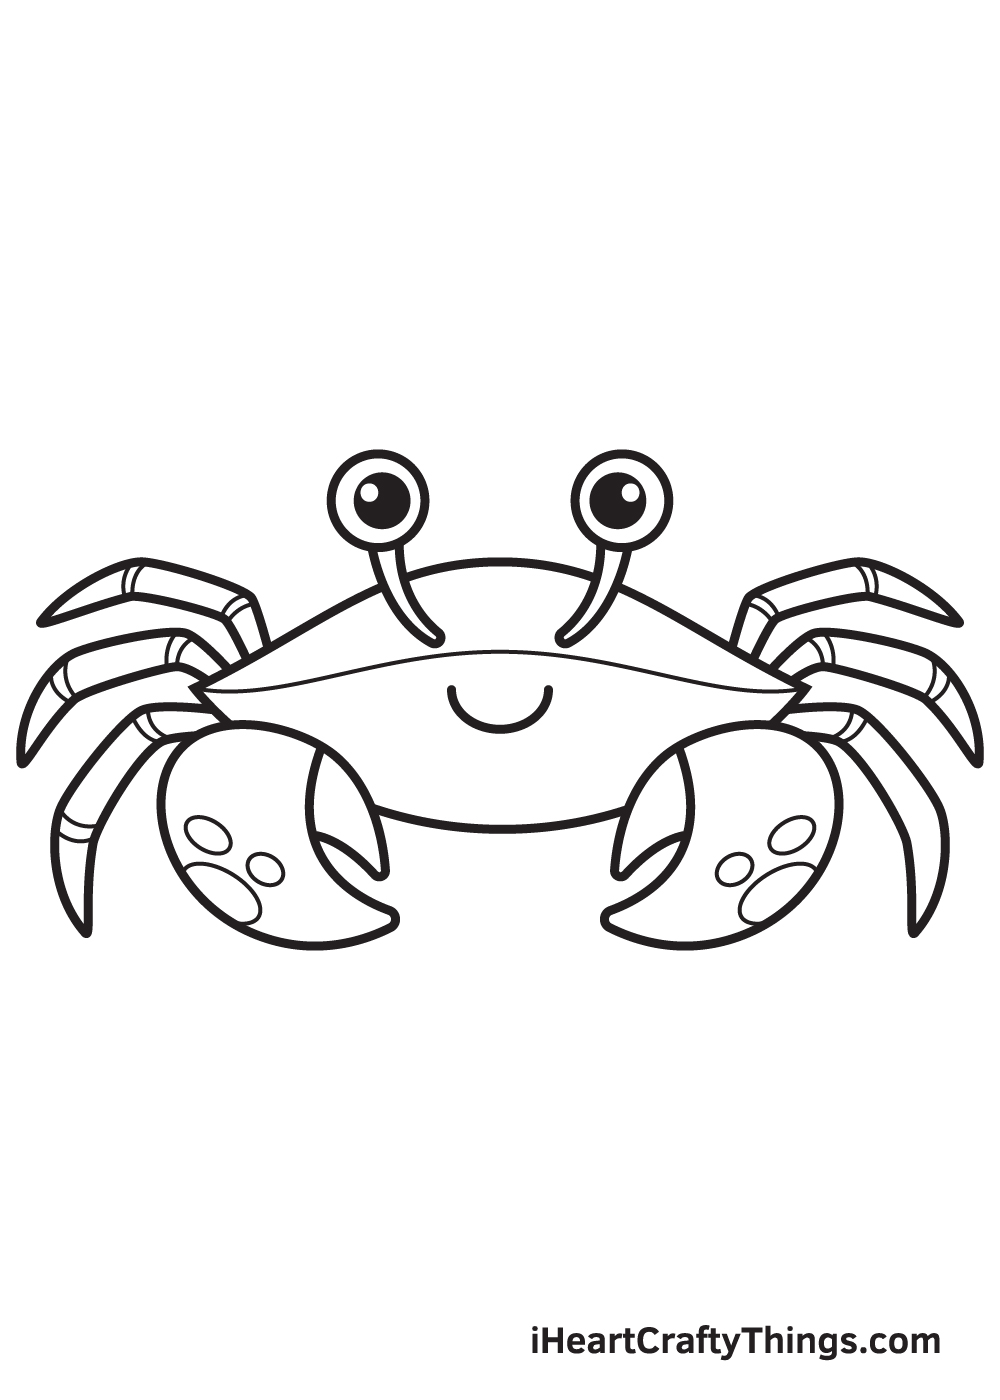 Crab Drawing – Step 9